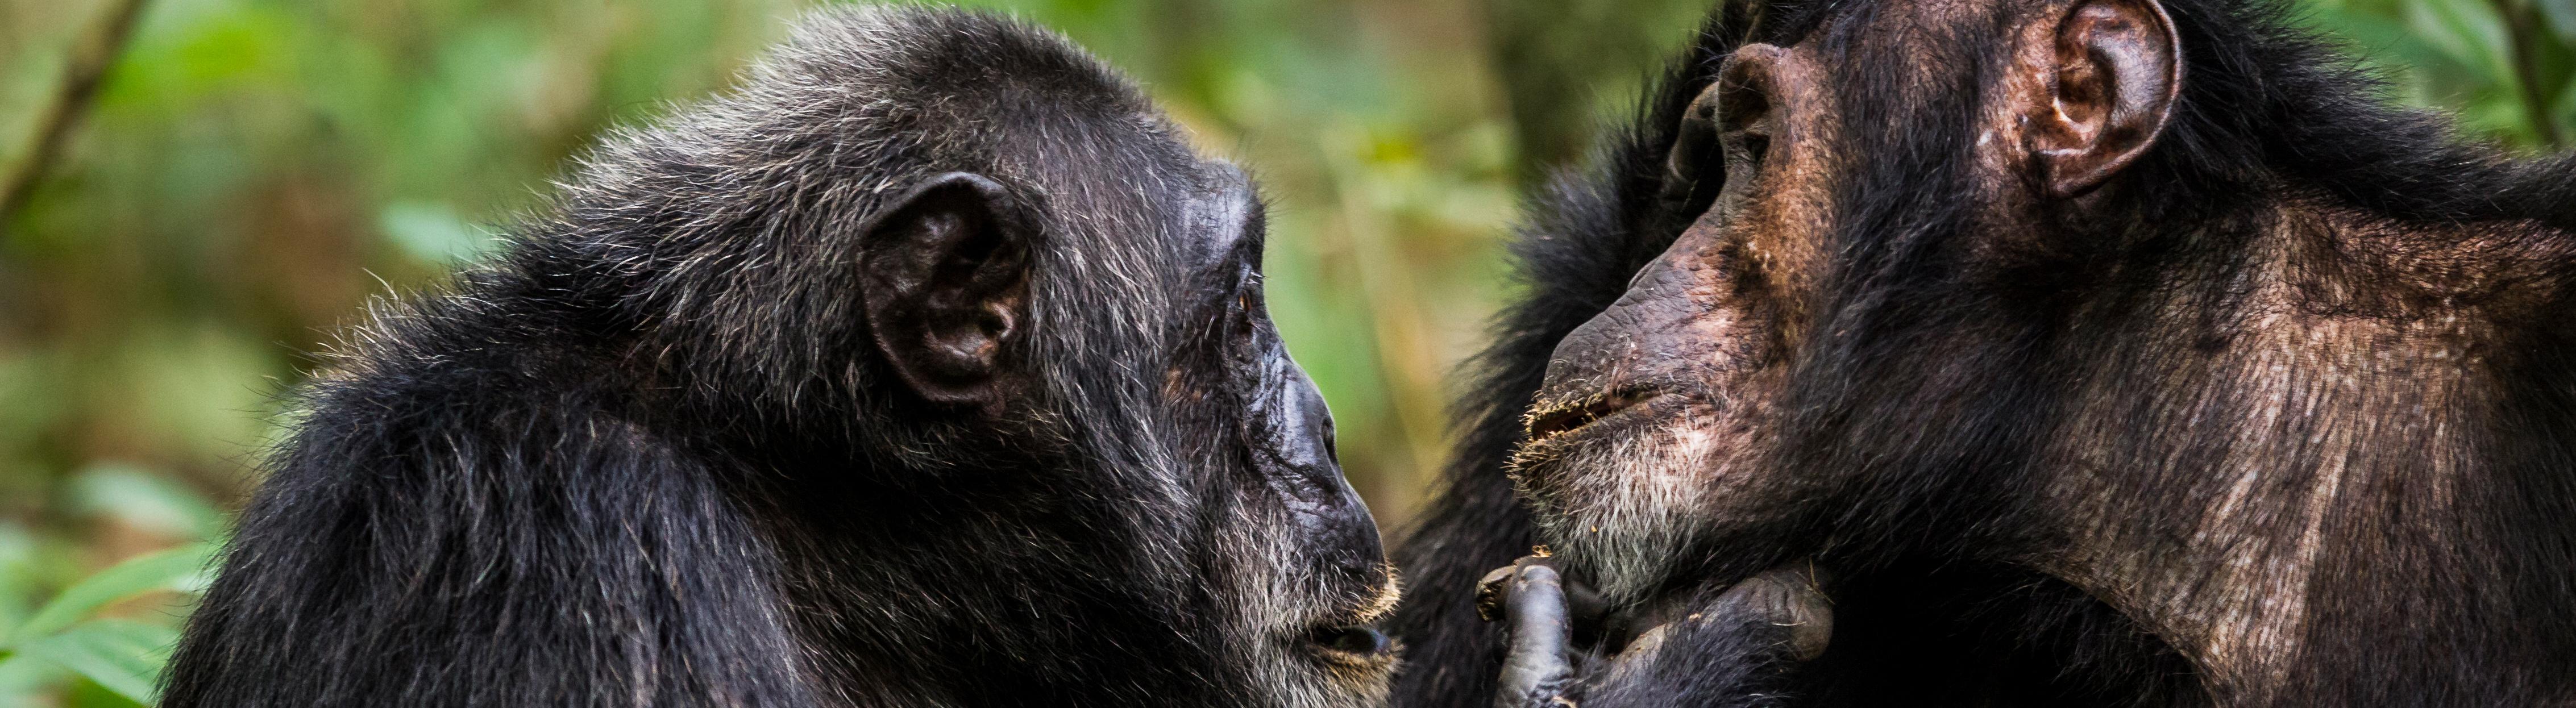 Chimpanzees (Pan troglodytes schweinfurthi) dominant male on left is the leader of the group, grooming one of his lieutenants, Kibale NP, Uganda